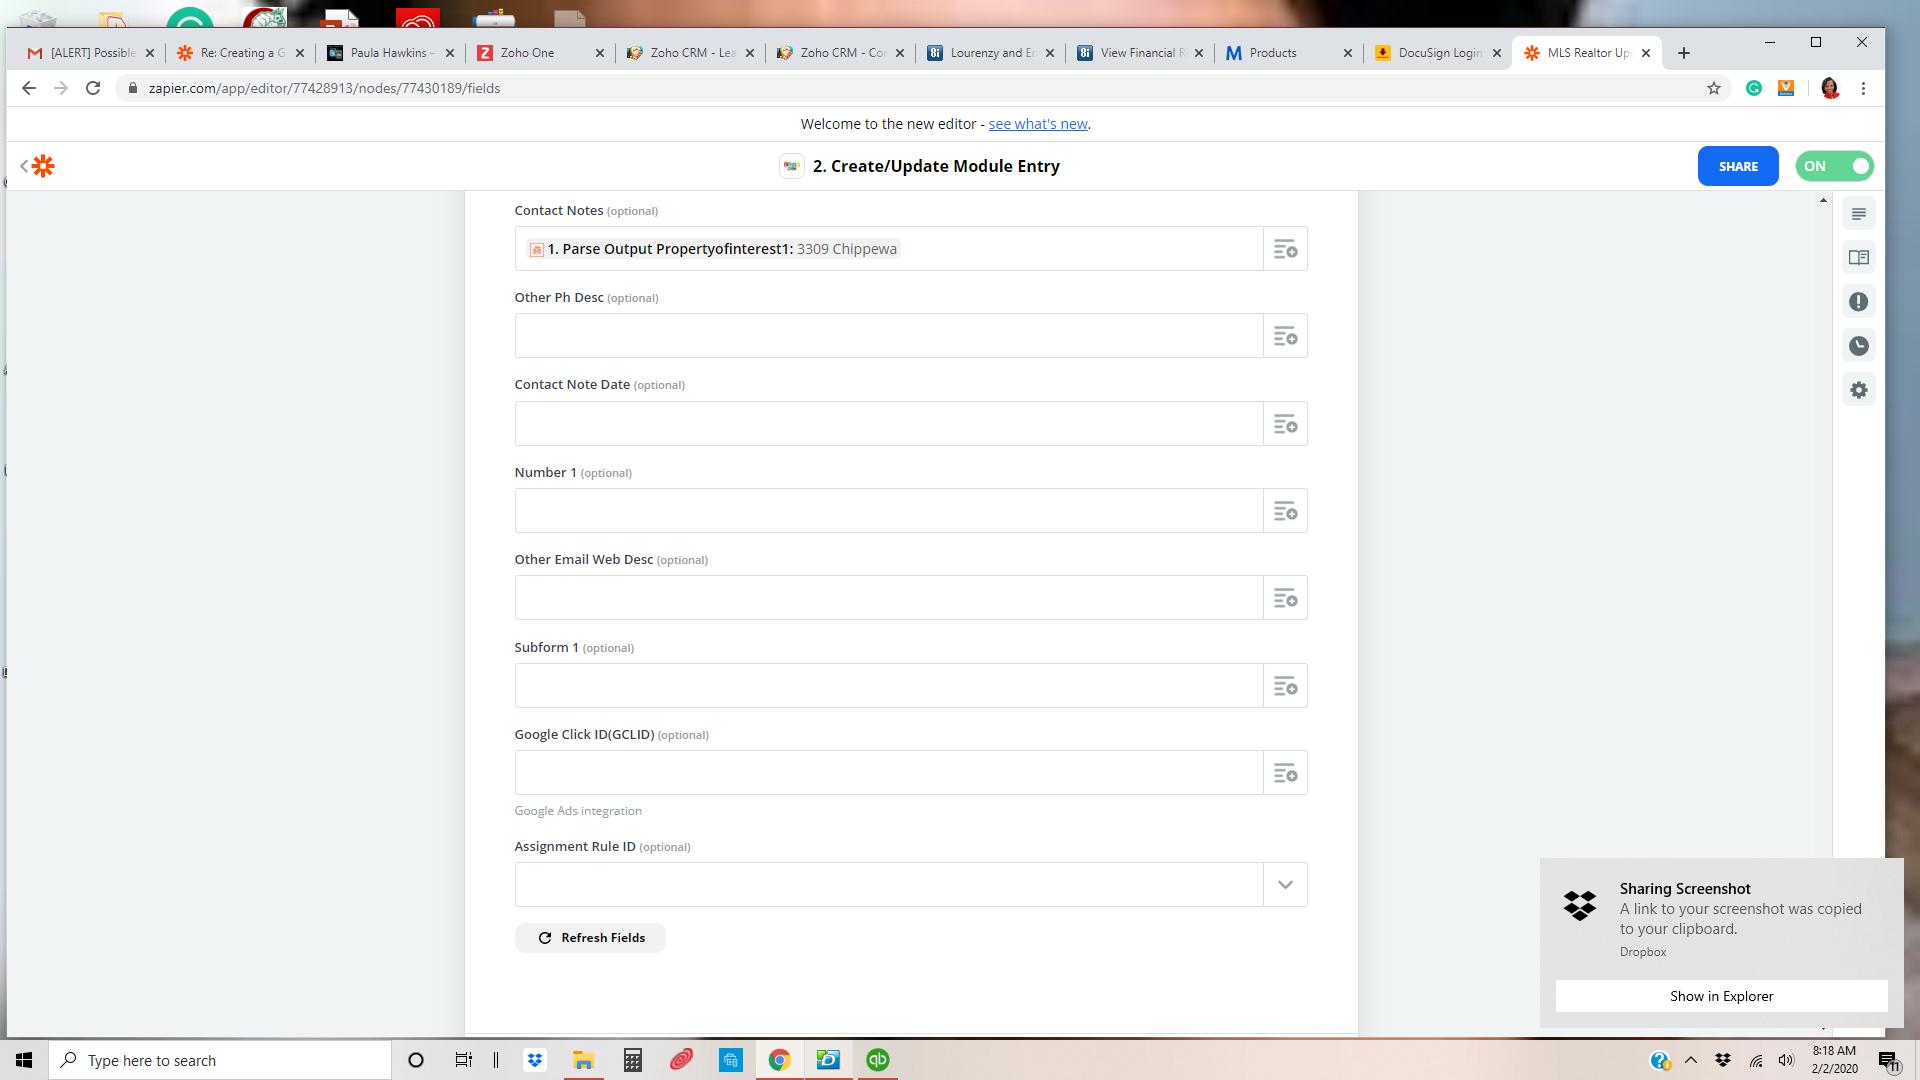 Screenshot 2020-02-02 08.18.46.png